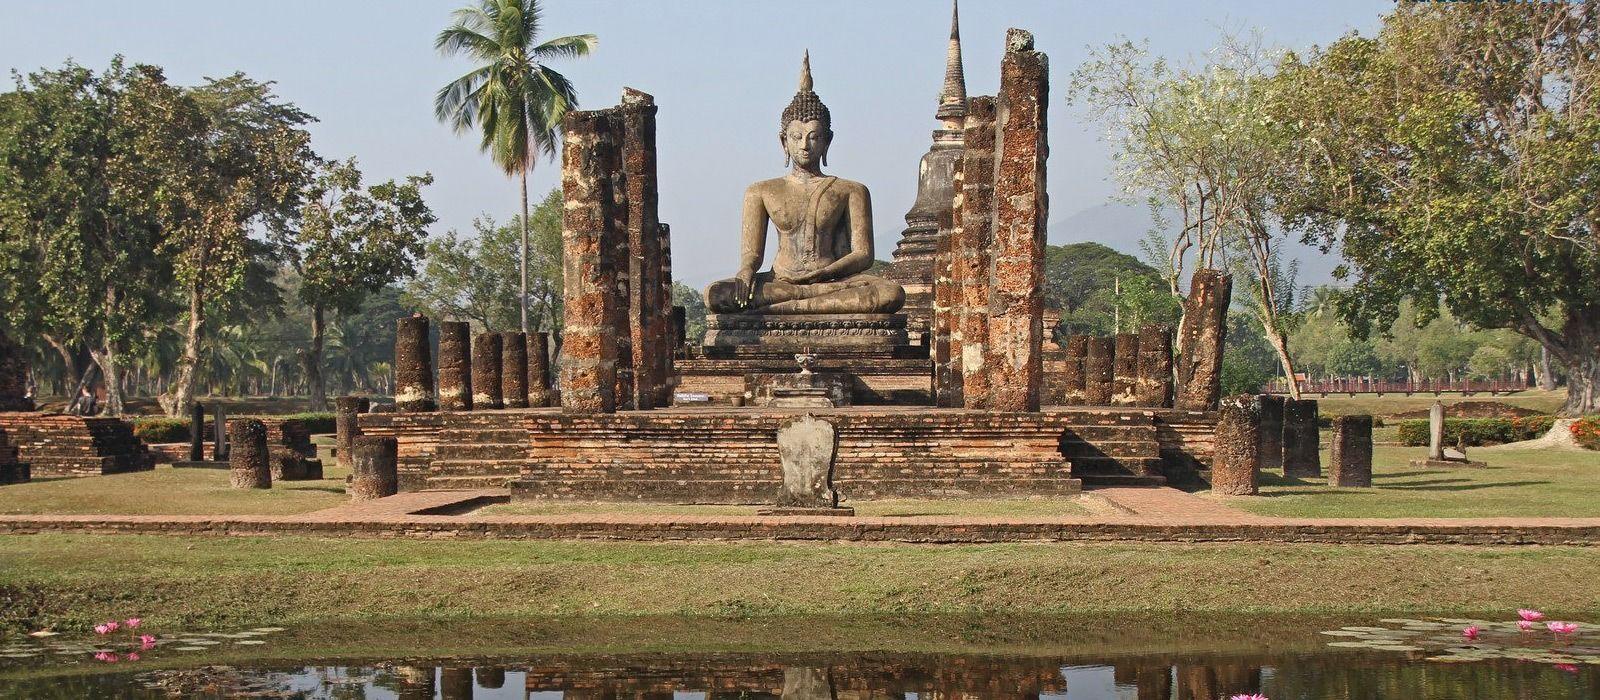 Reiseziel Sukhothai Thailand